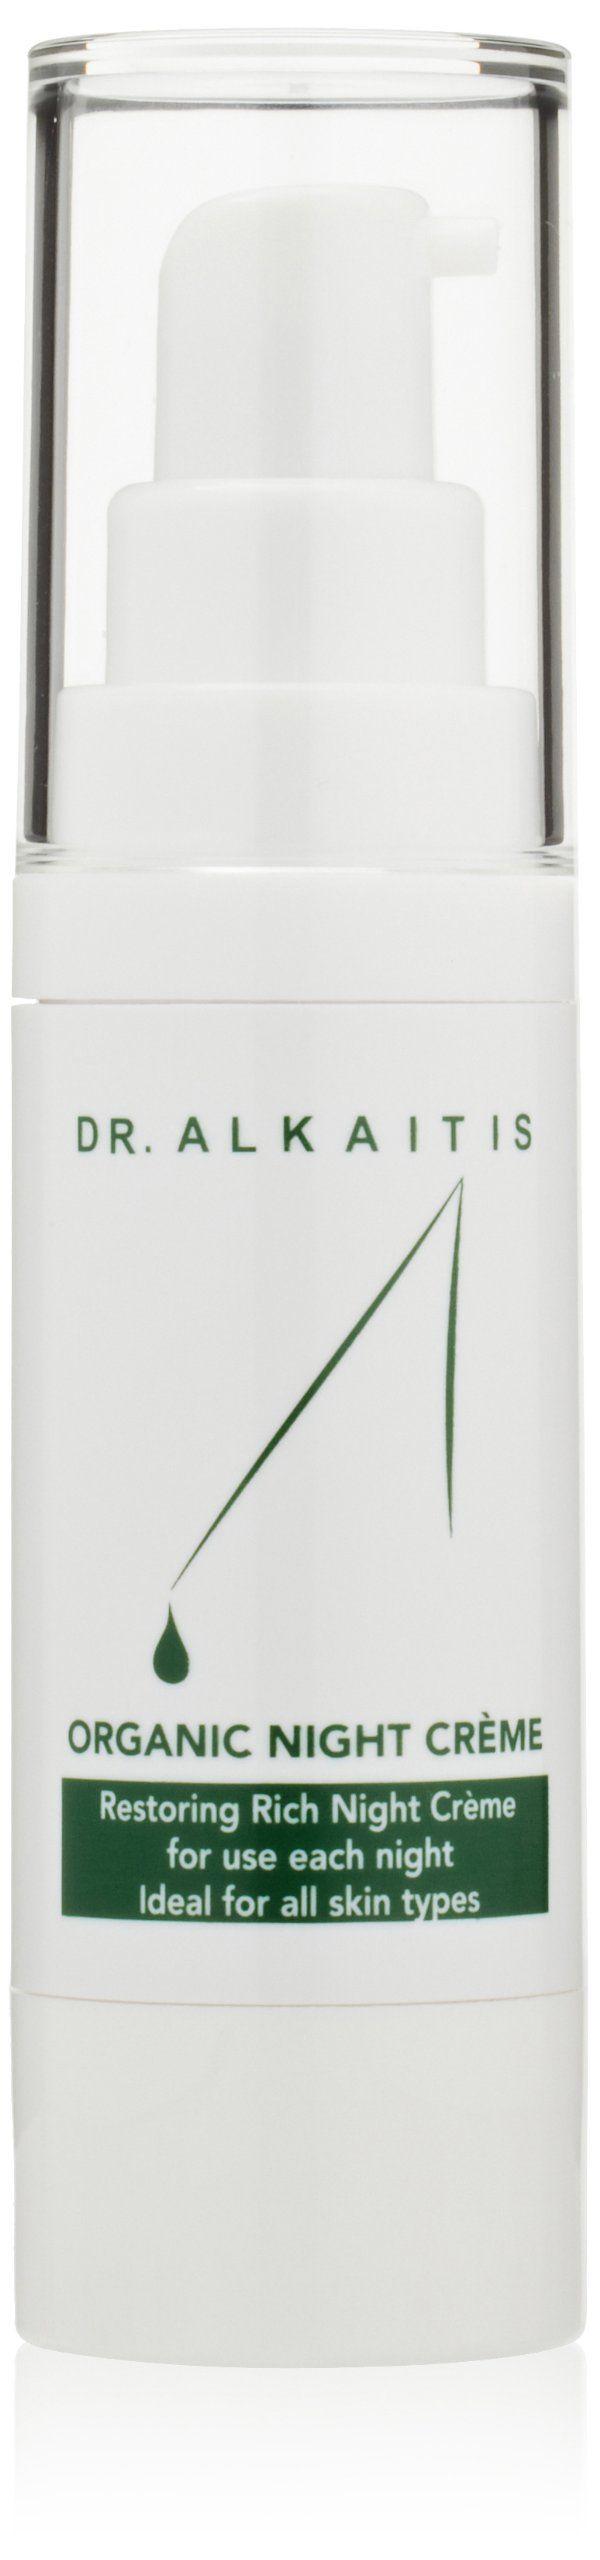 DR. ALKAITIS Organic Night Crème, 1 fl. oz.